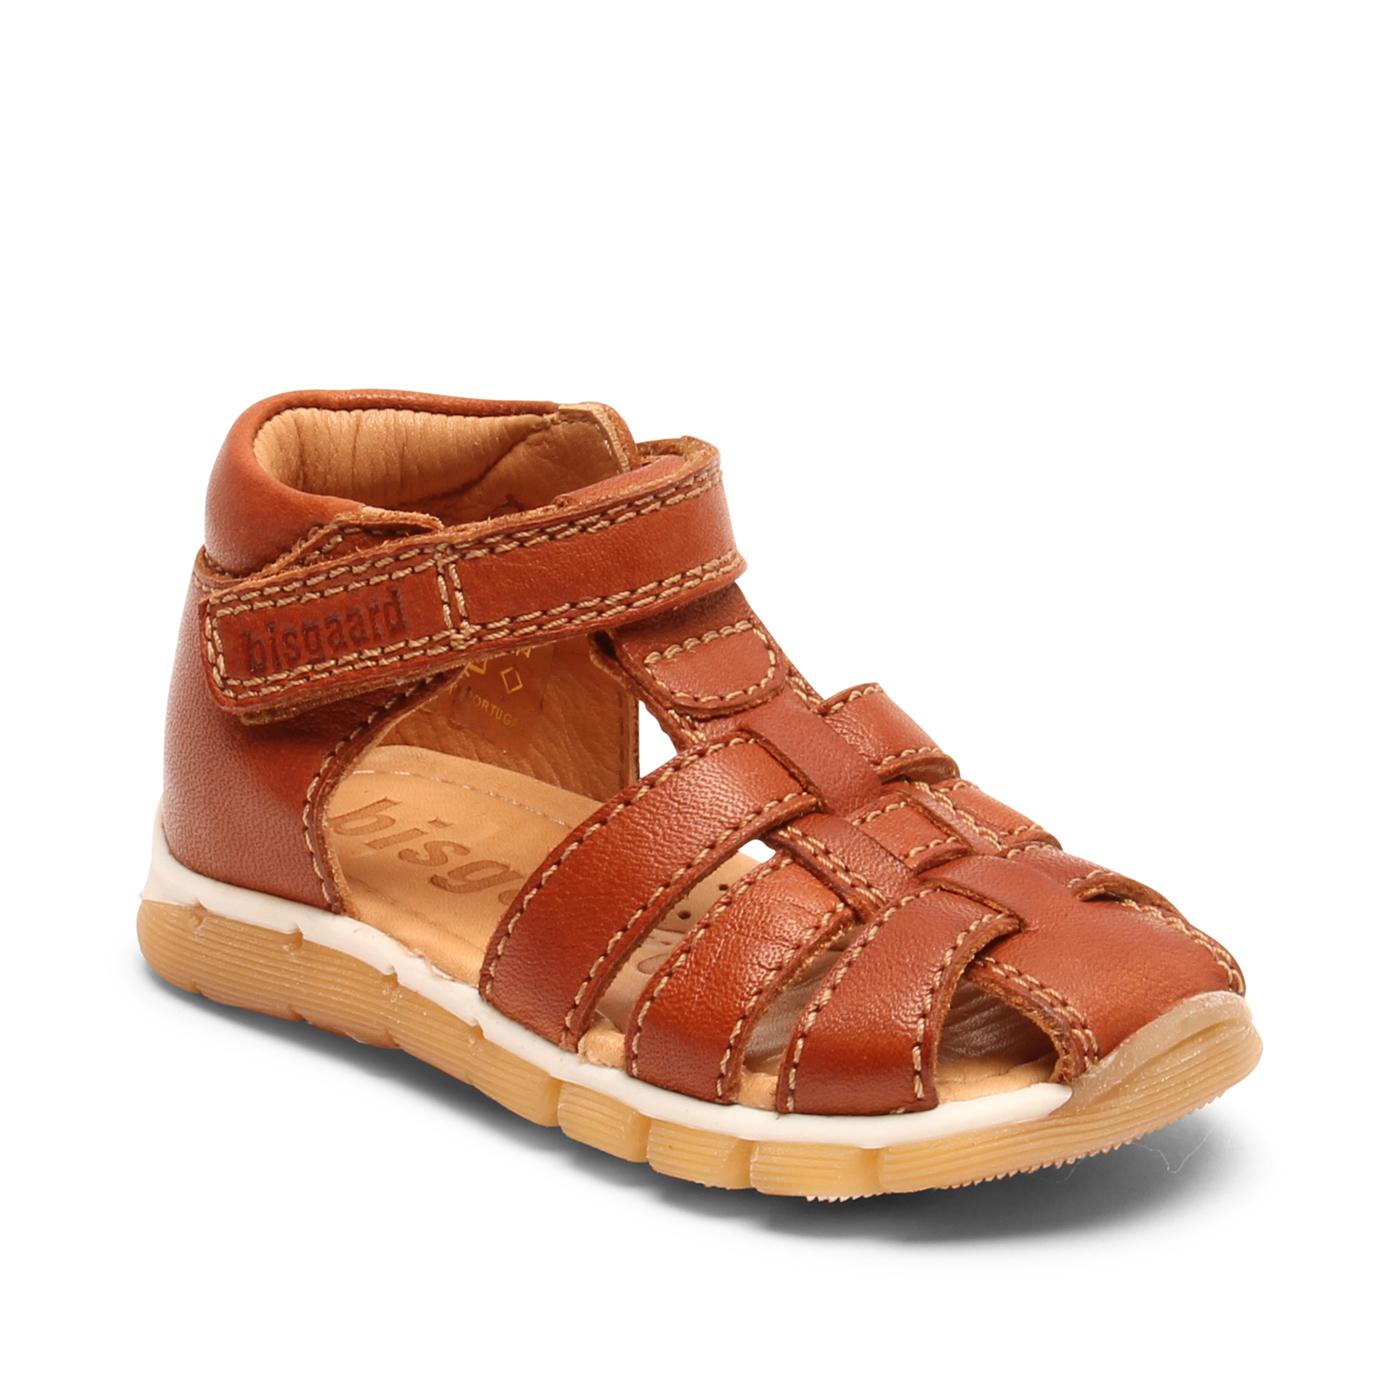 Bisgaard Carly sandal